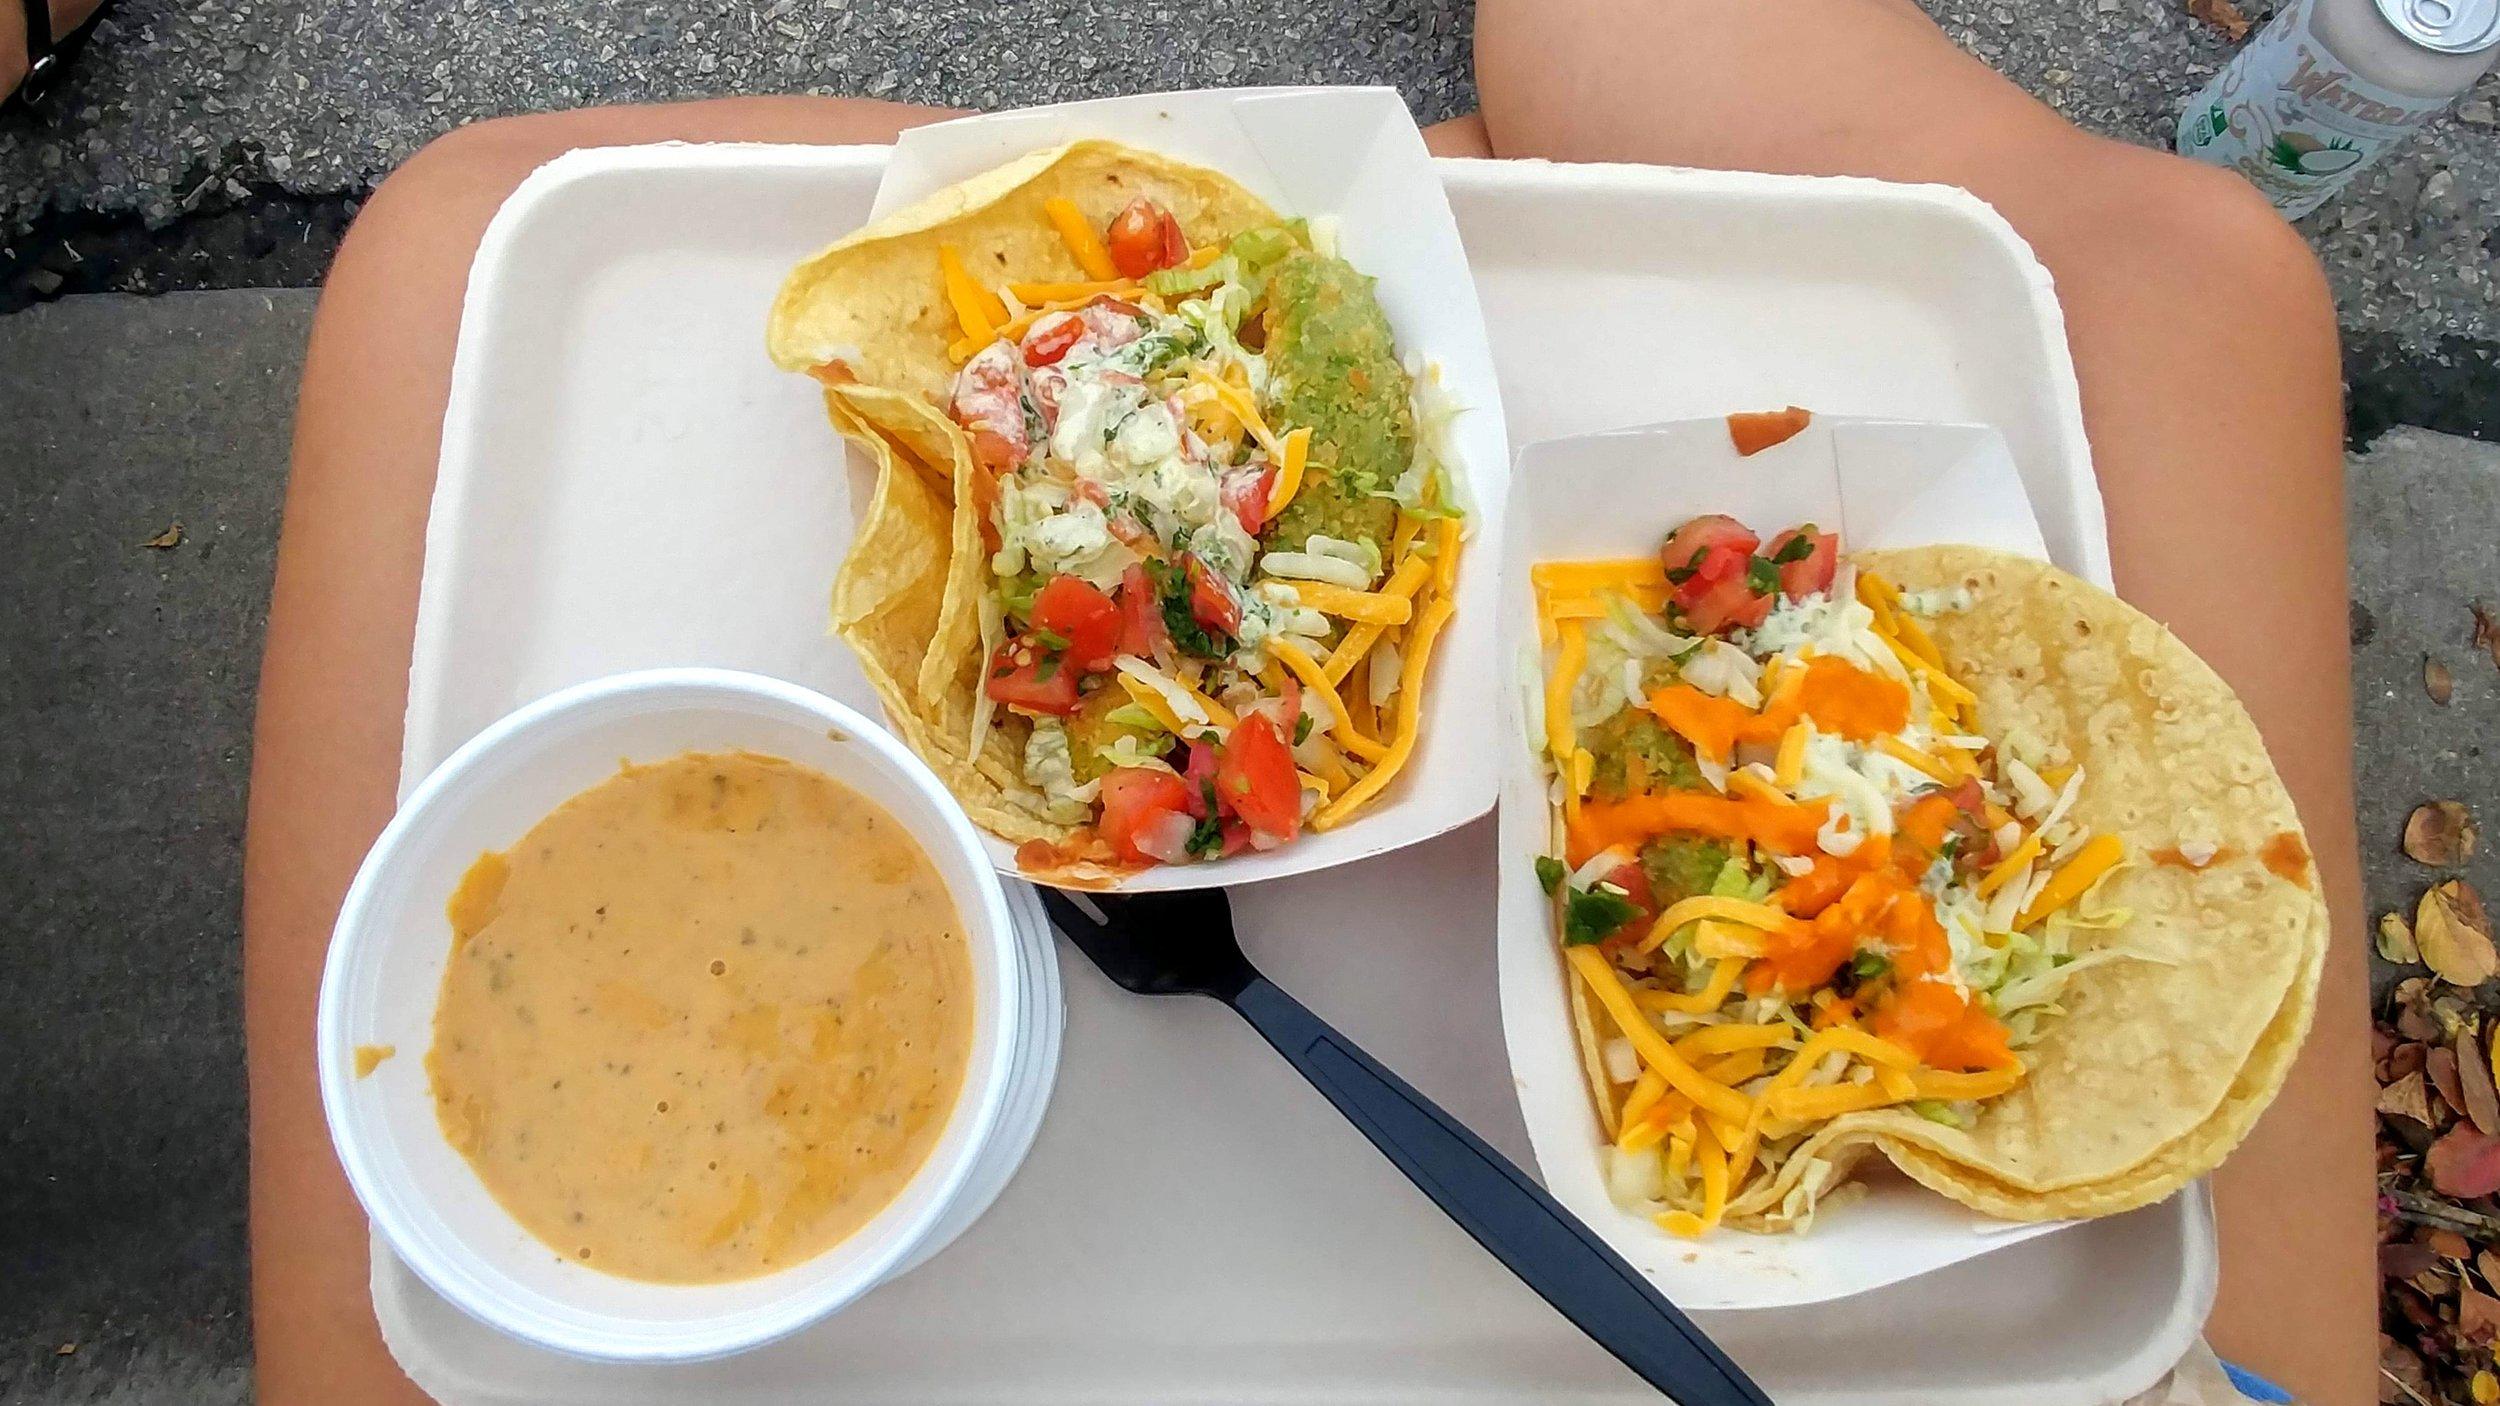 torchy's tacos fried avocado tacos in austin texas